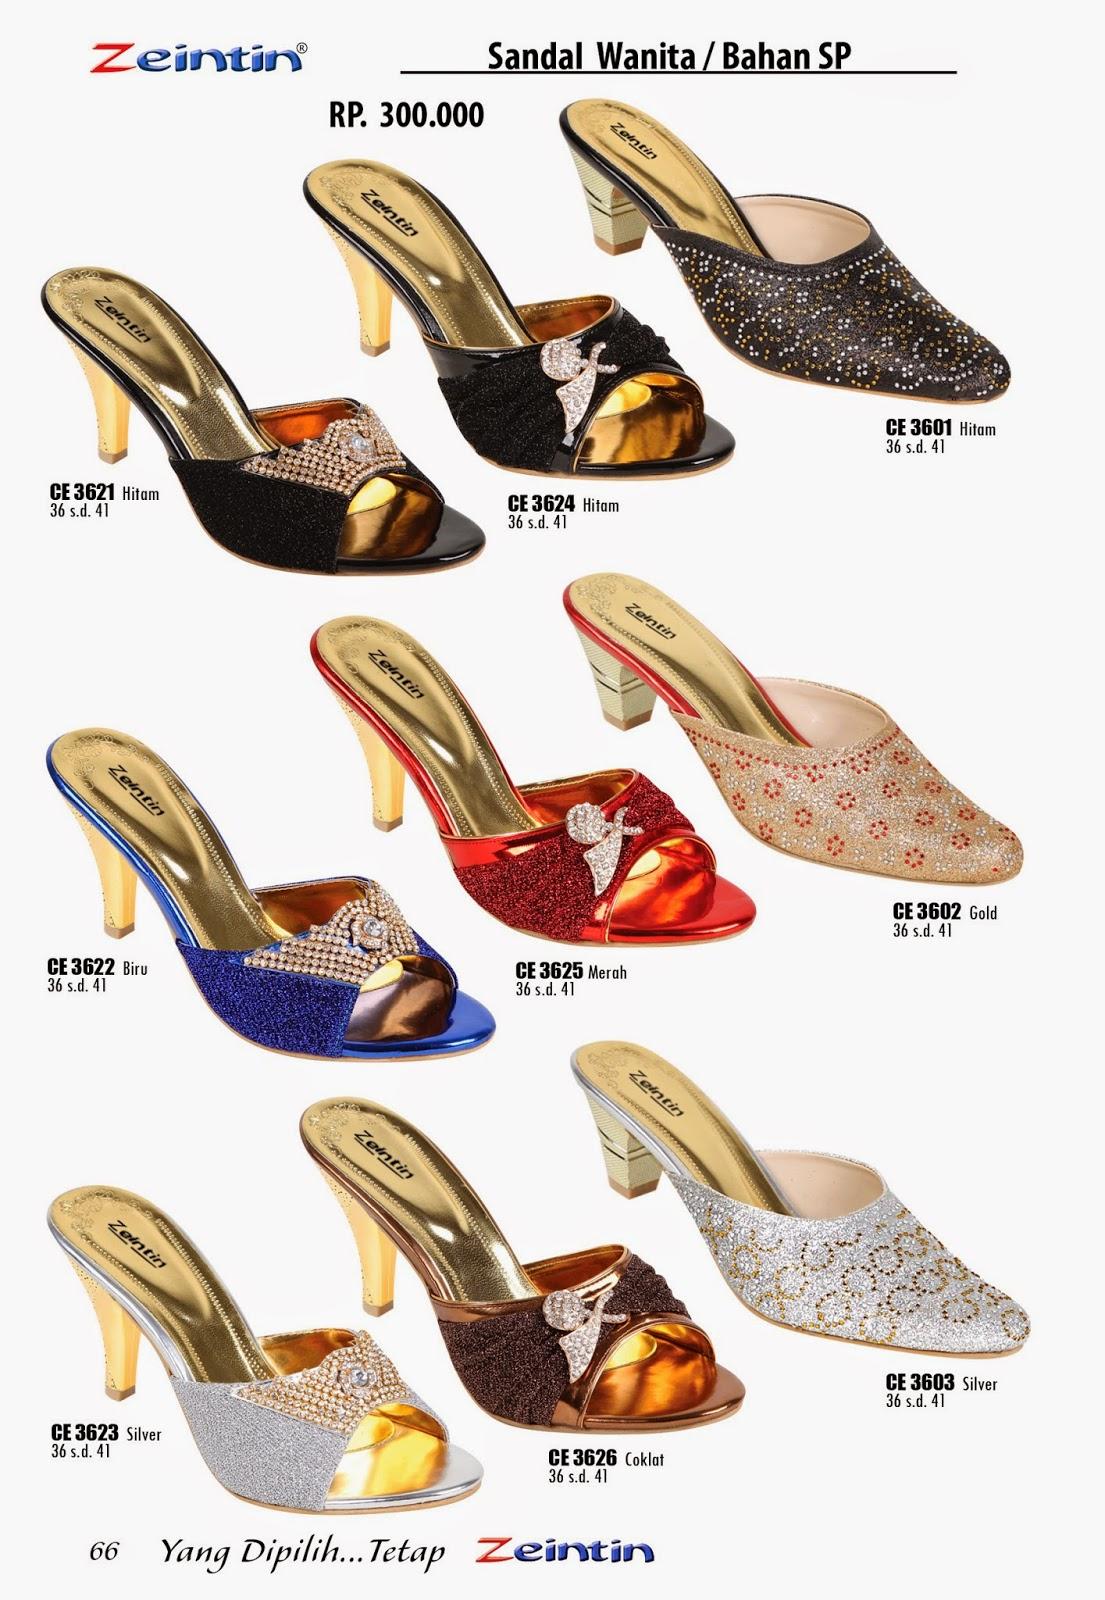 Sandal Pesta Zeintin Katalog Edisi Brilian 11